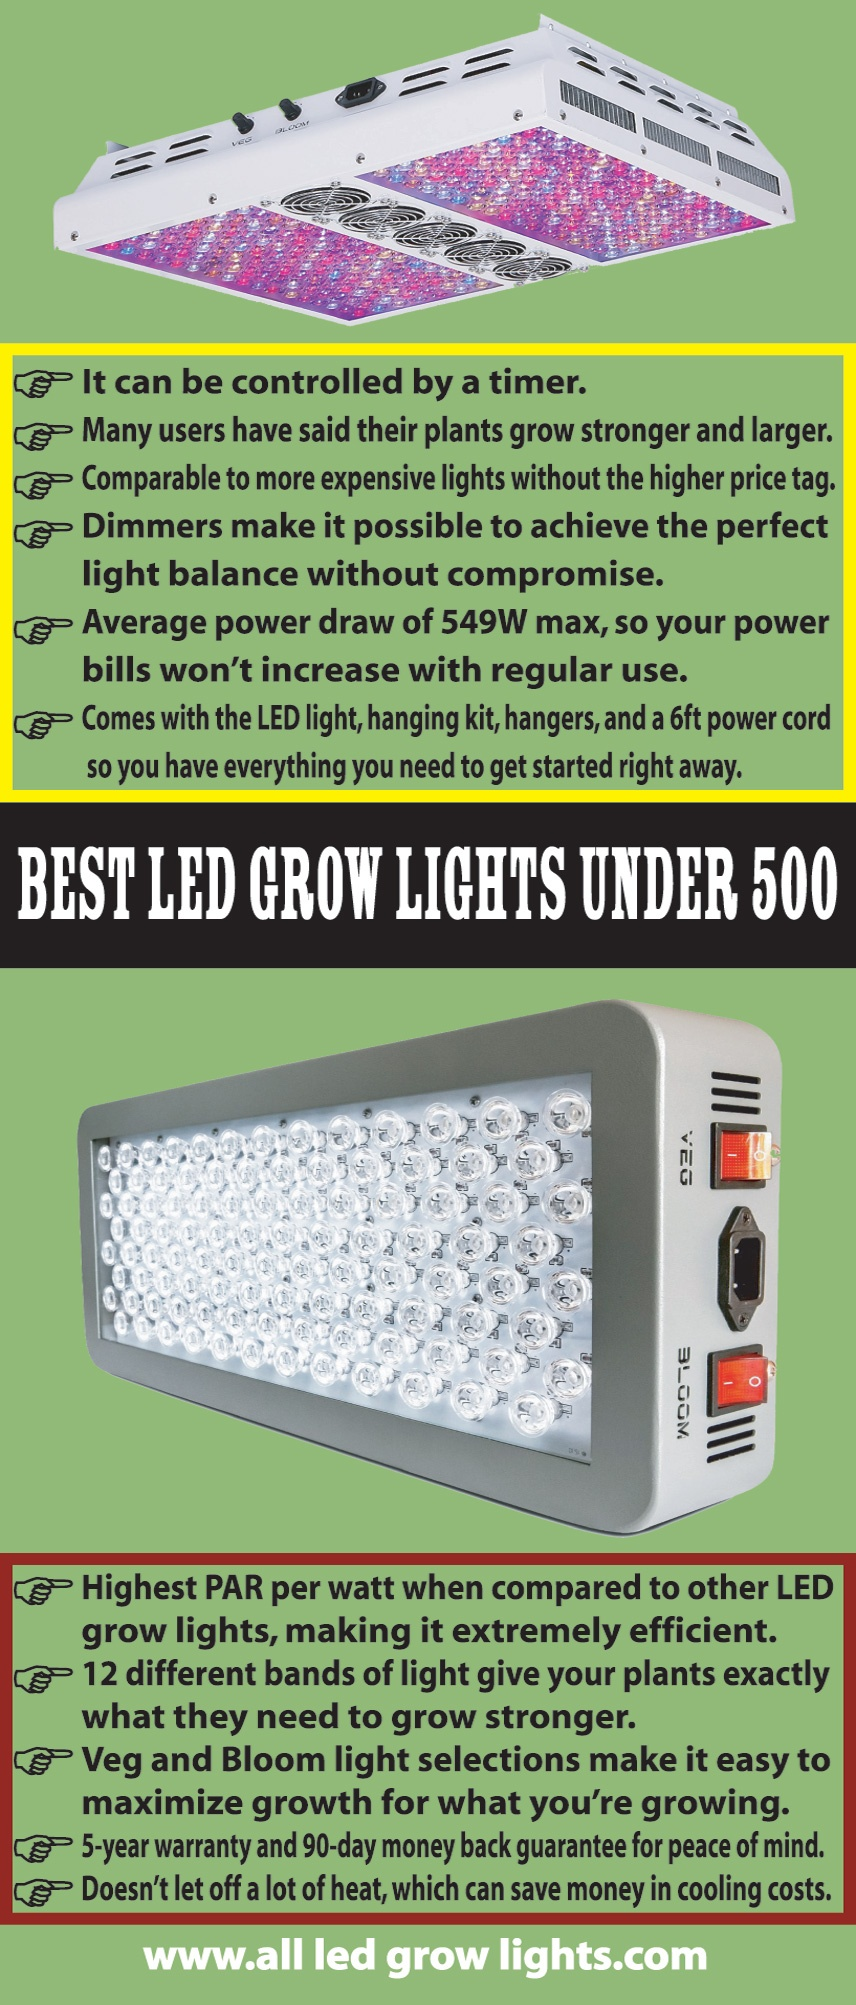 Best LED Grow Light Under 500